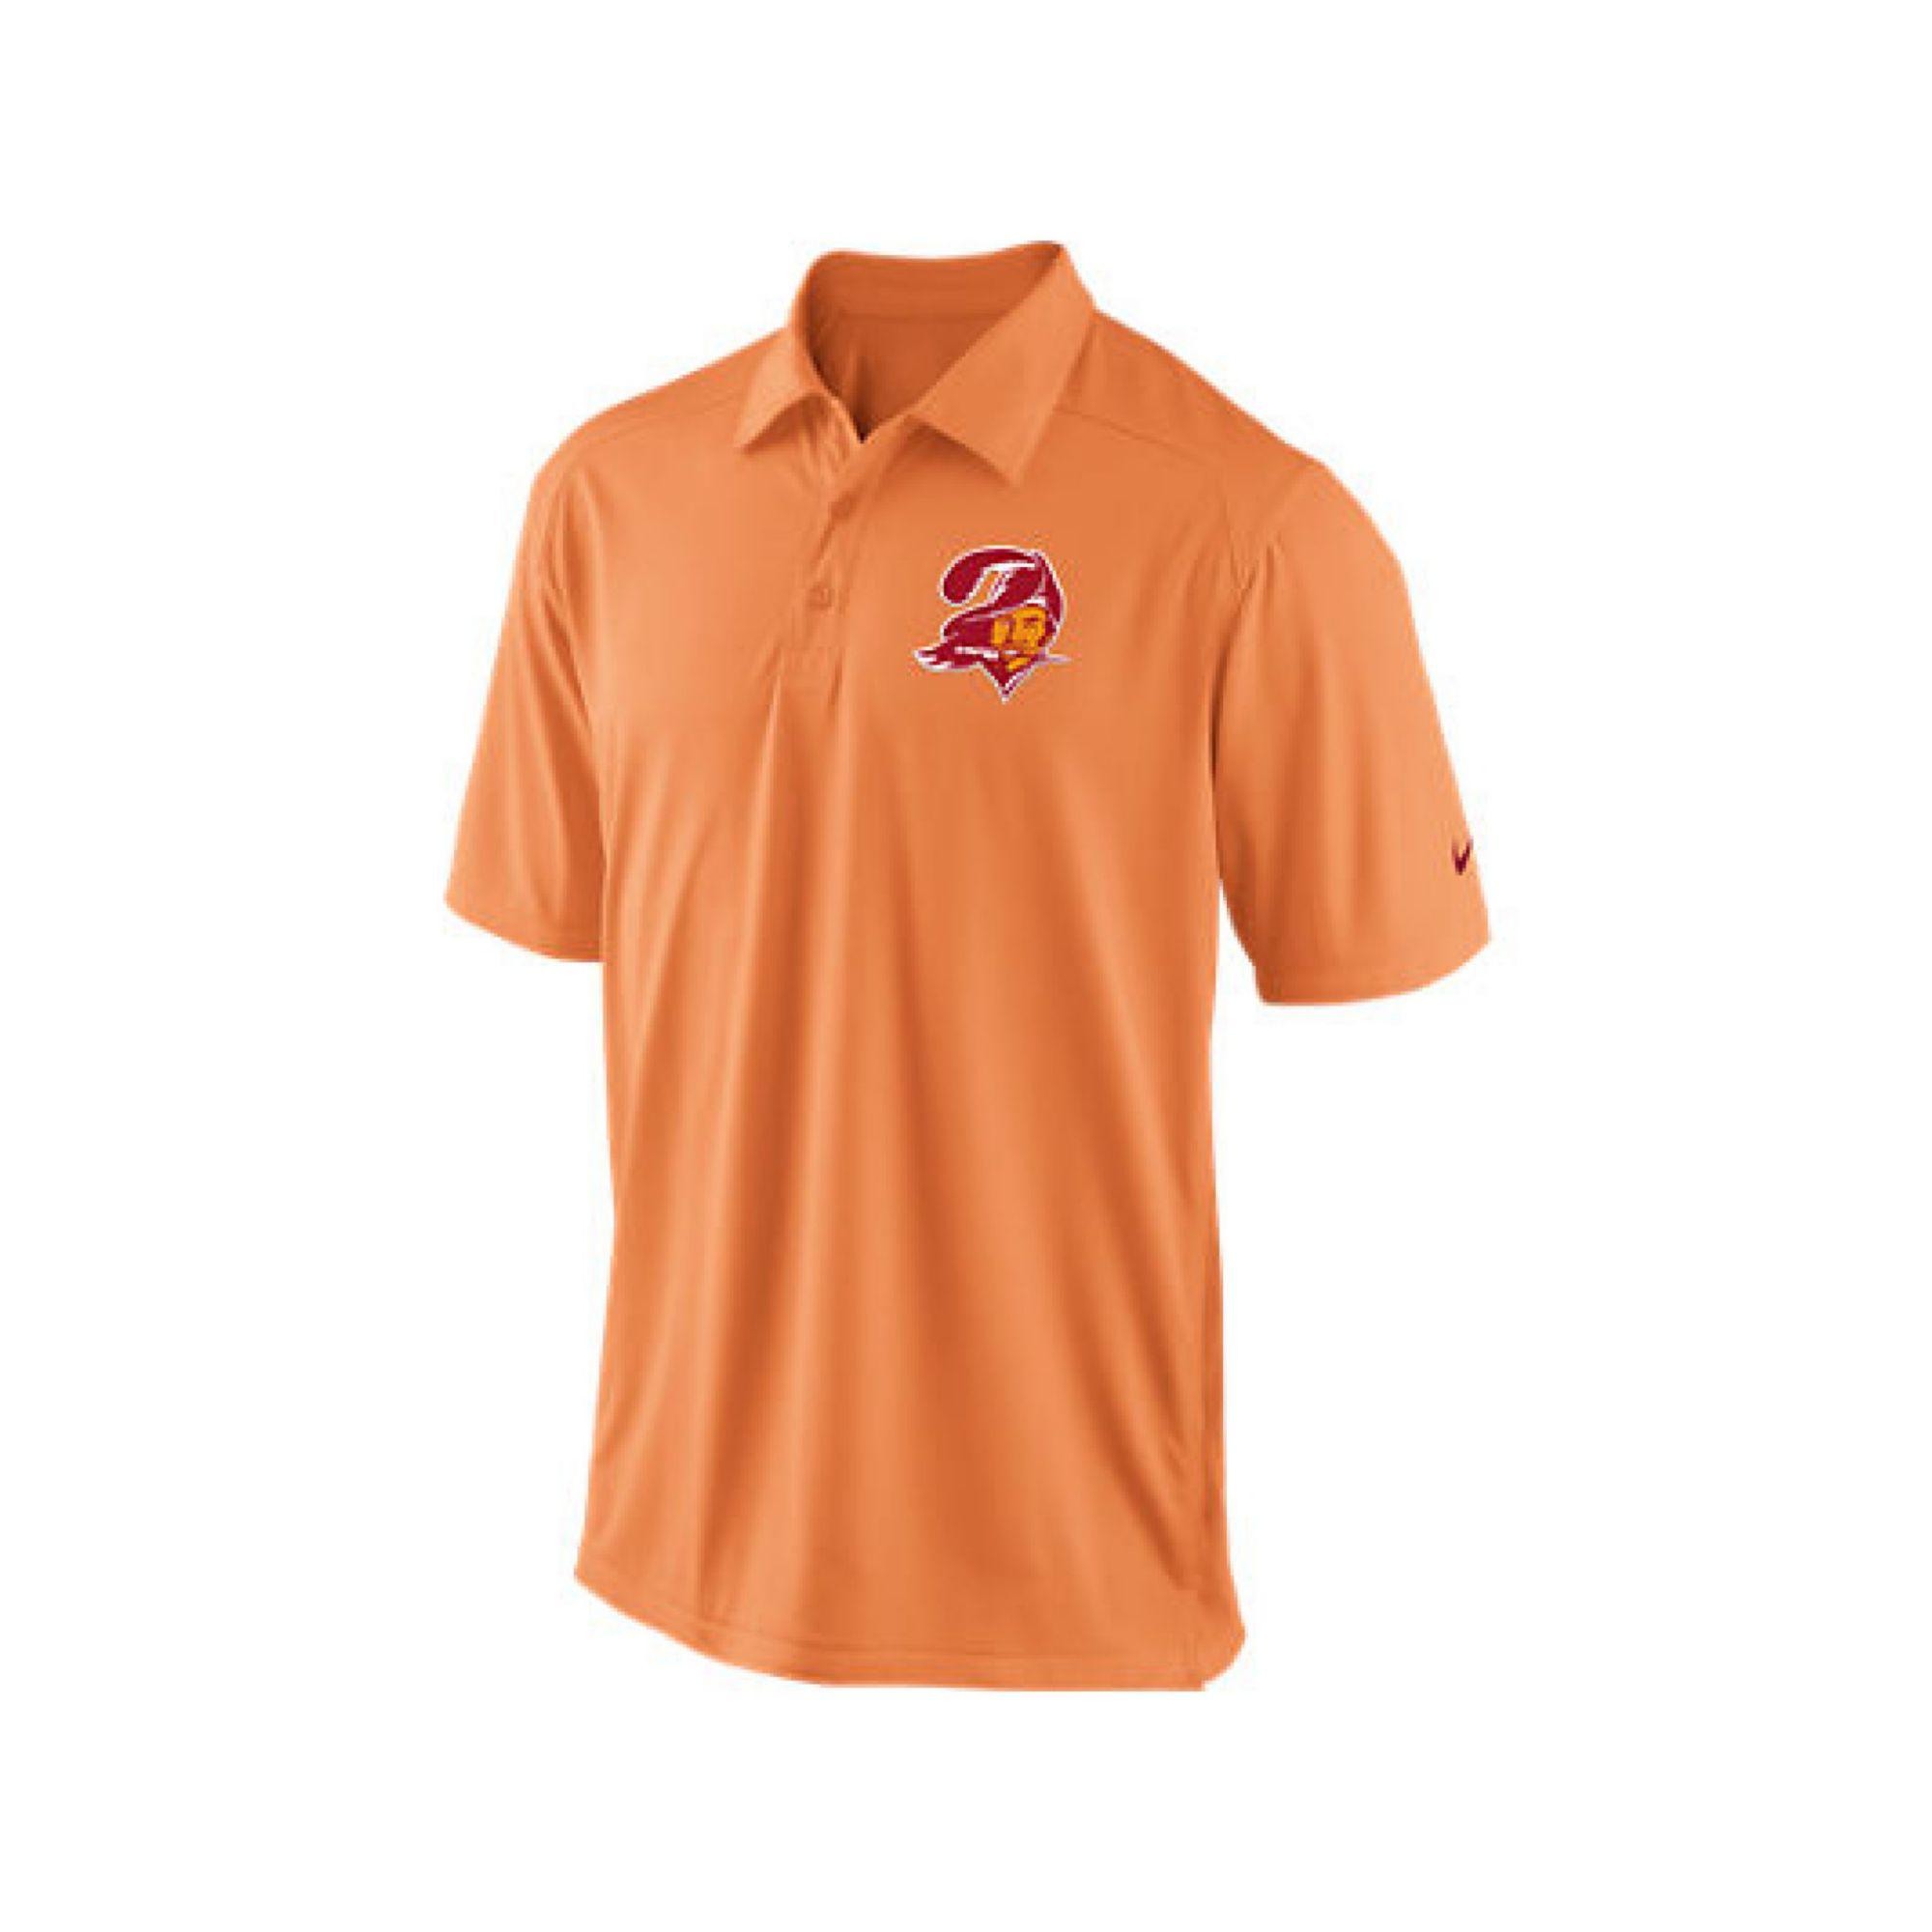 Nike mens tampa bay buccaneers football coaches polo shirt for South bay t shirt printing